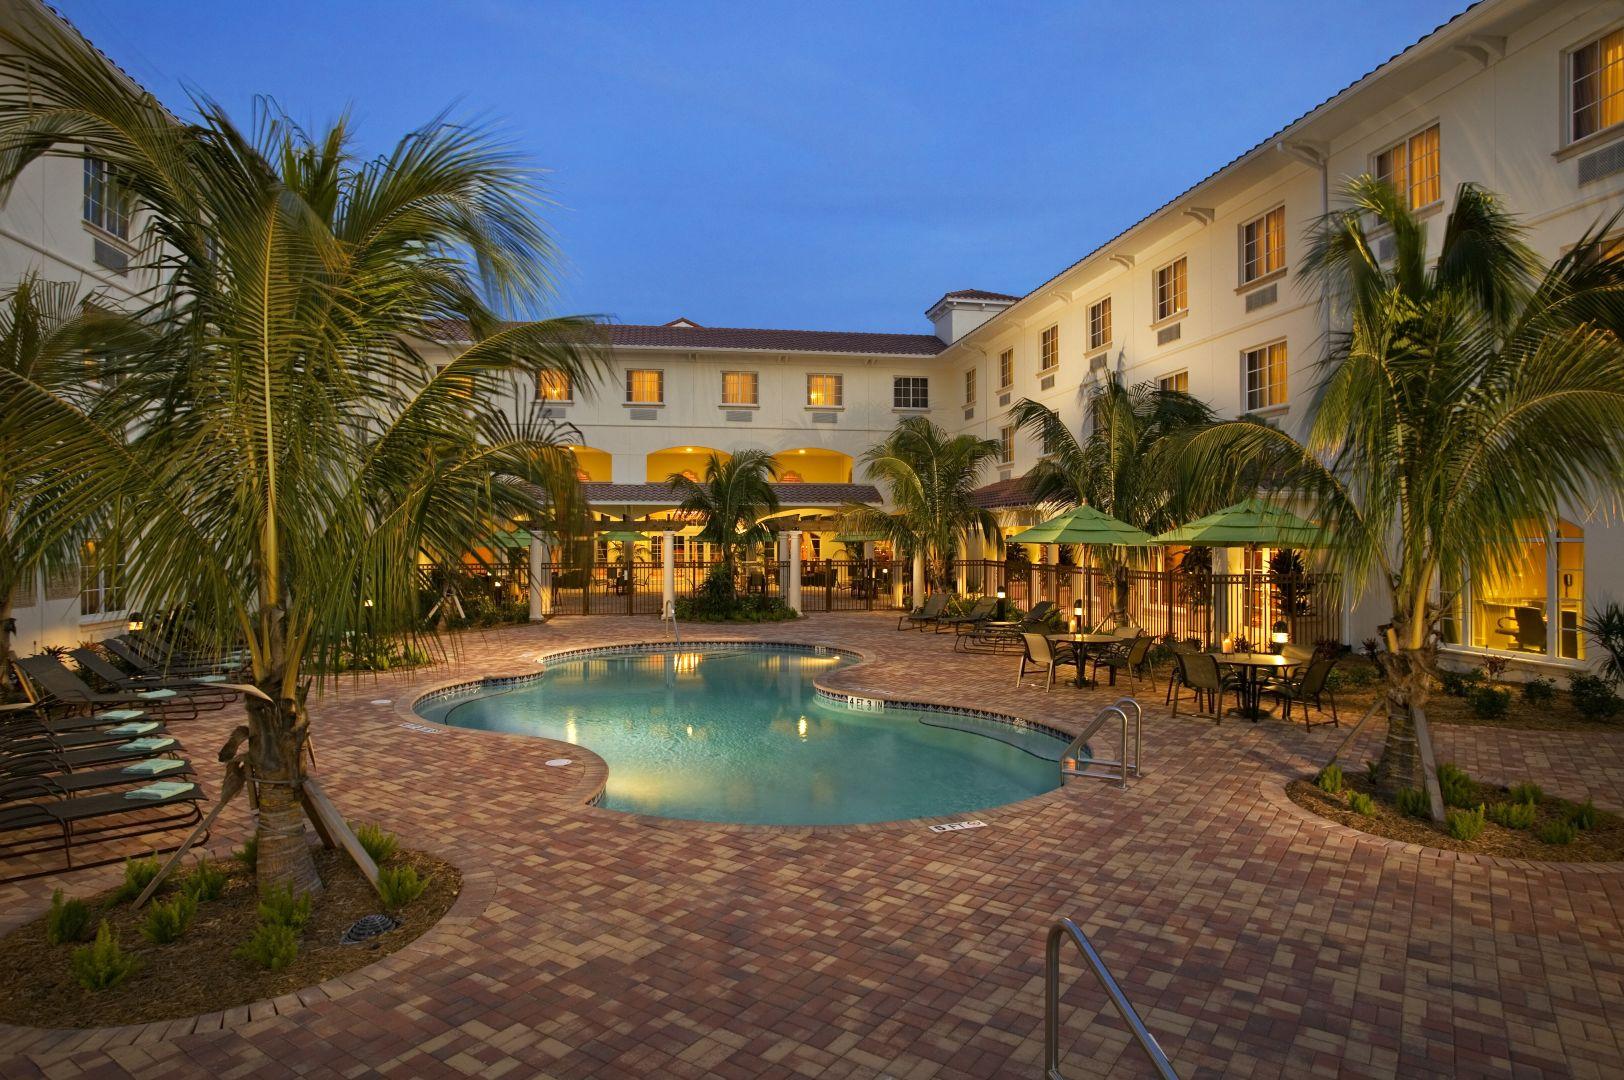 Hilton Garden Inn Port St. Lucie, FL | Official Hotel Site